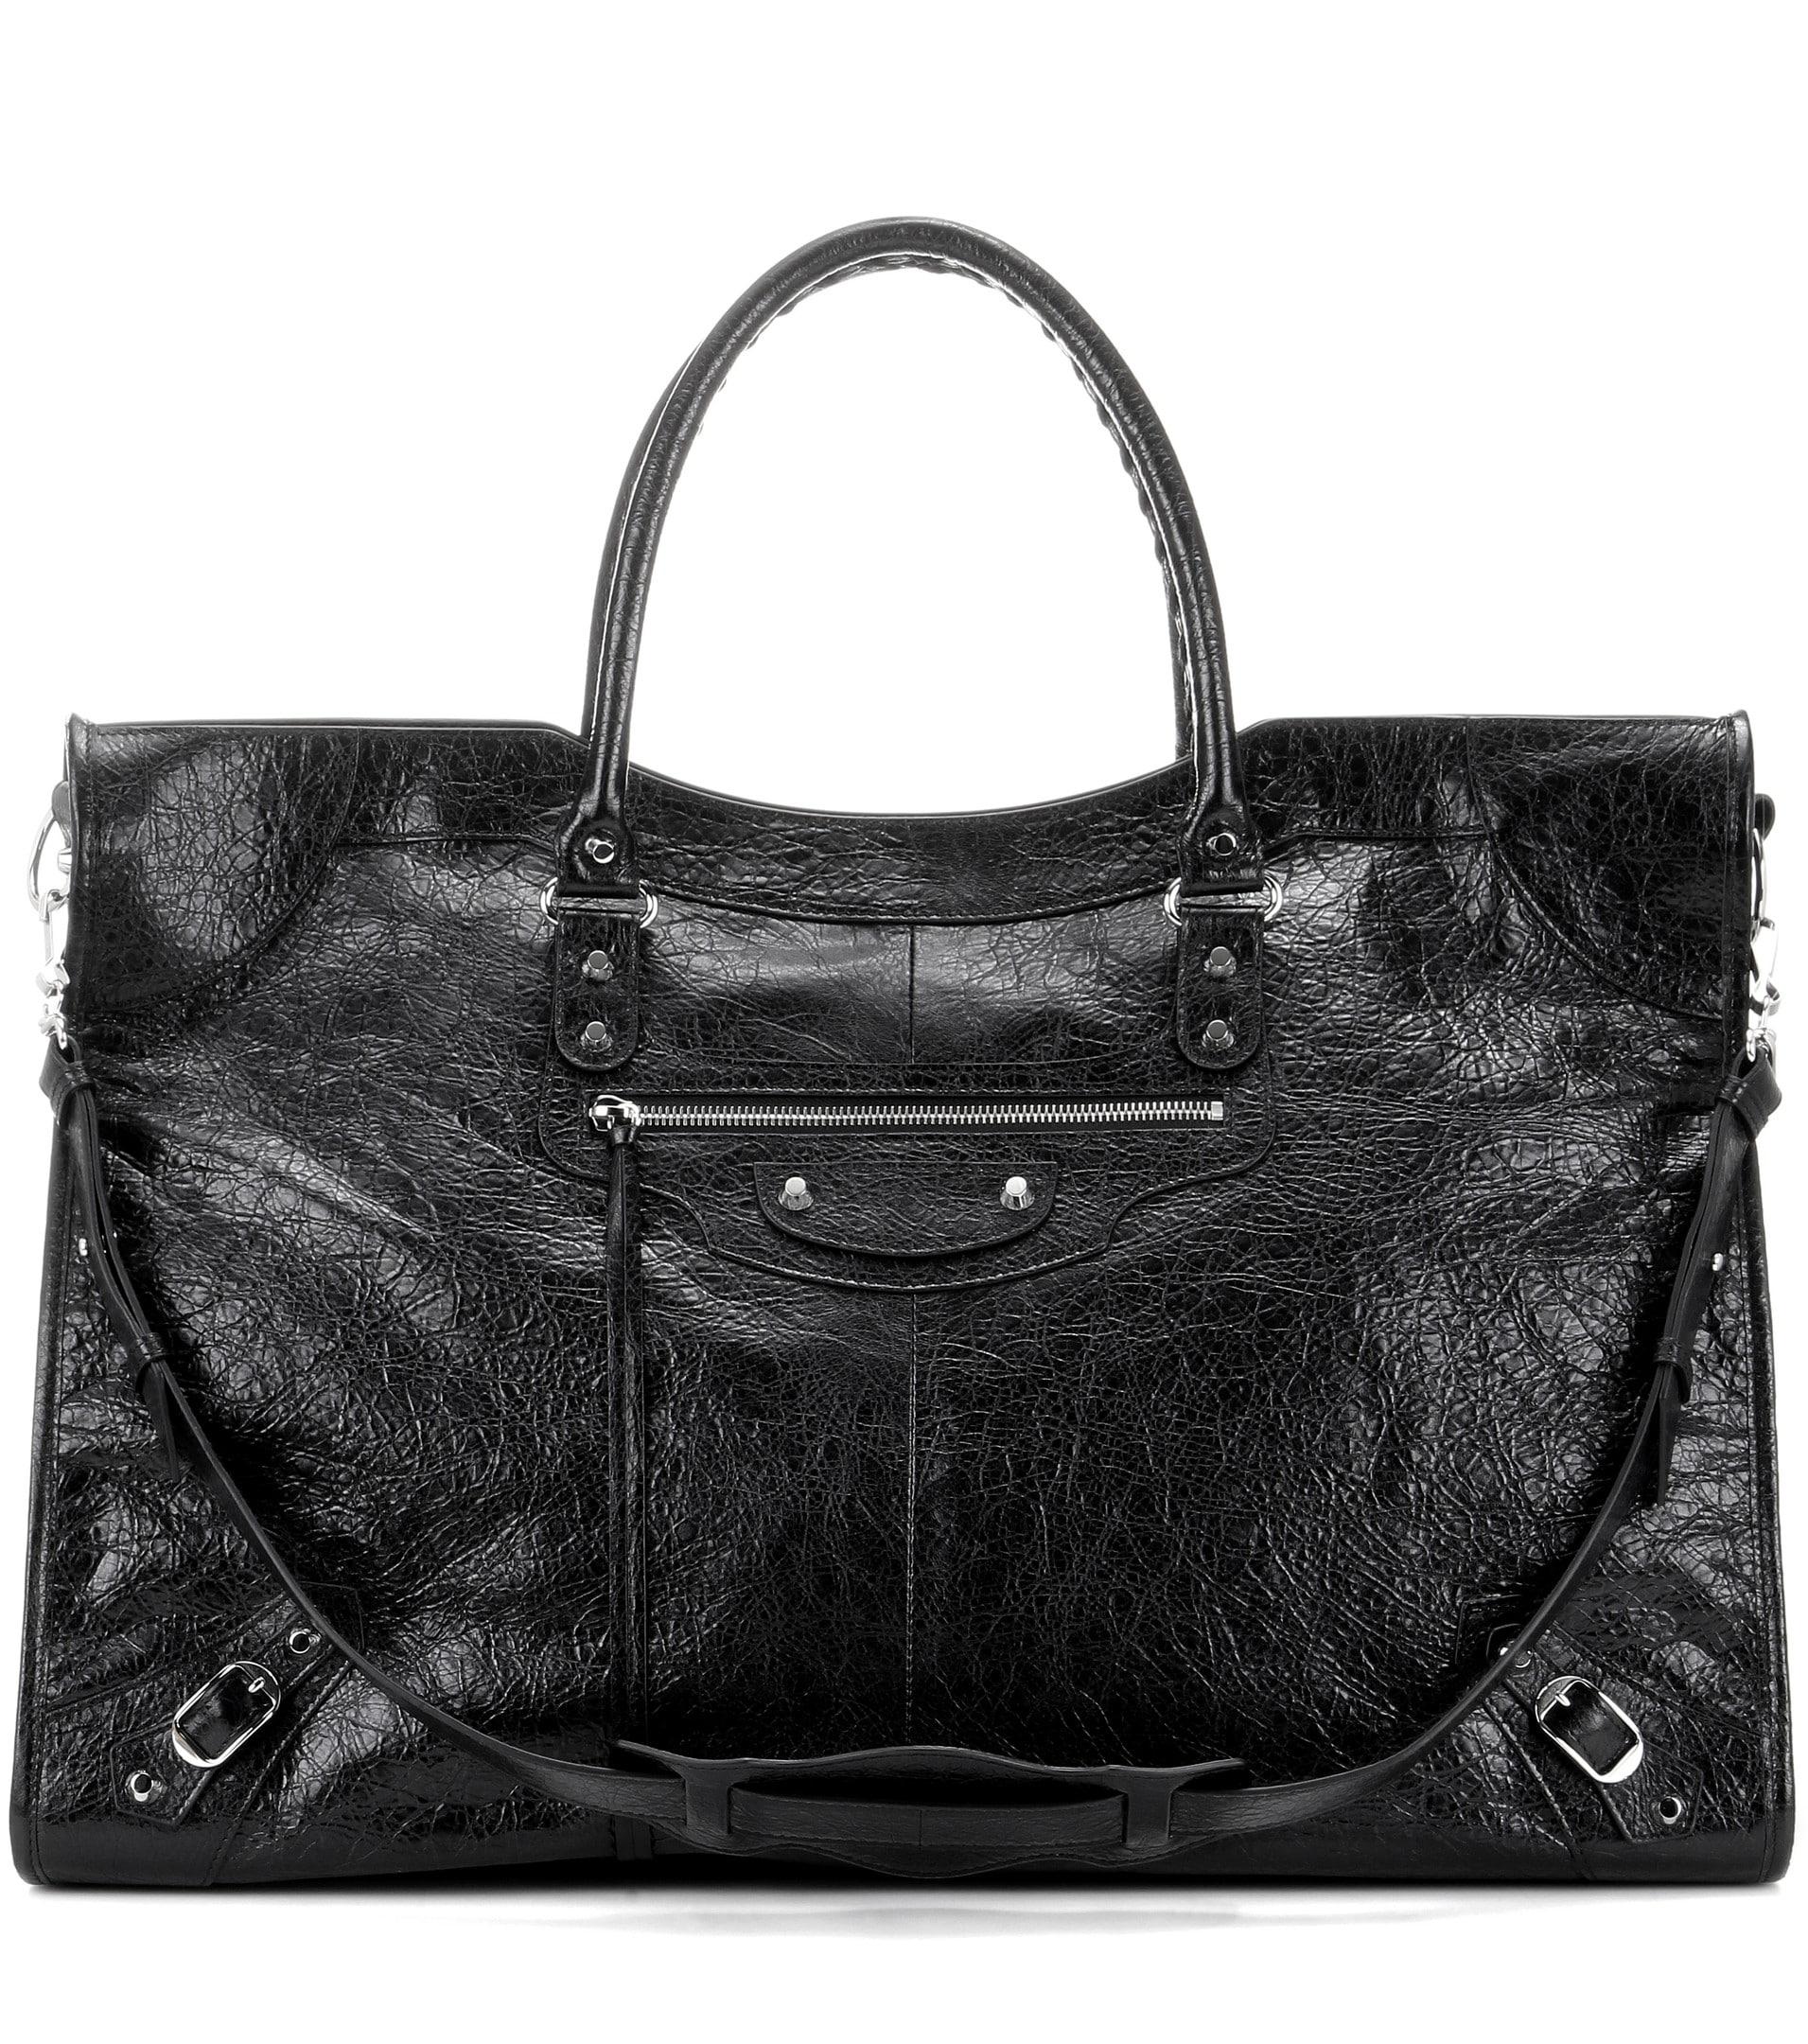 2017 Fashion CollectionSpotted Bag Balenciaga Springsummer dxWBrCoe